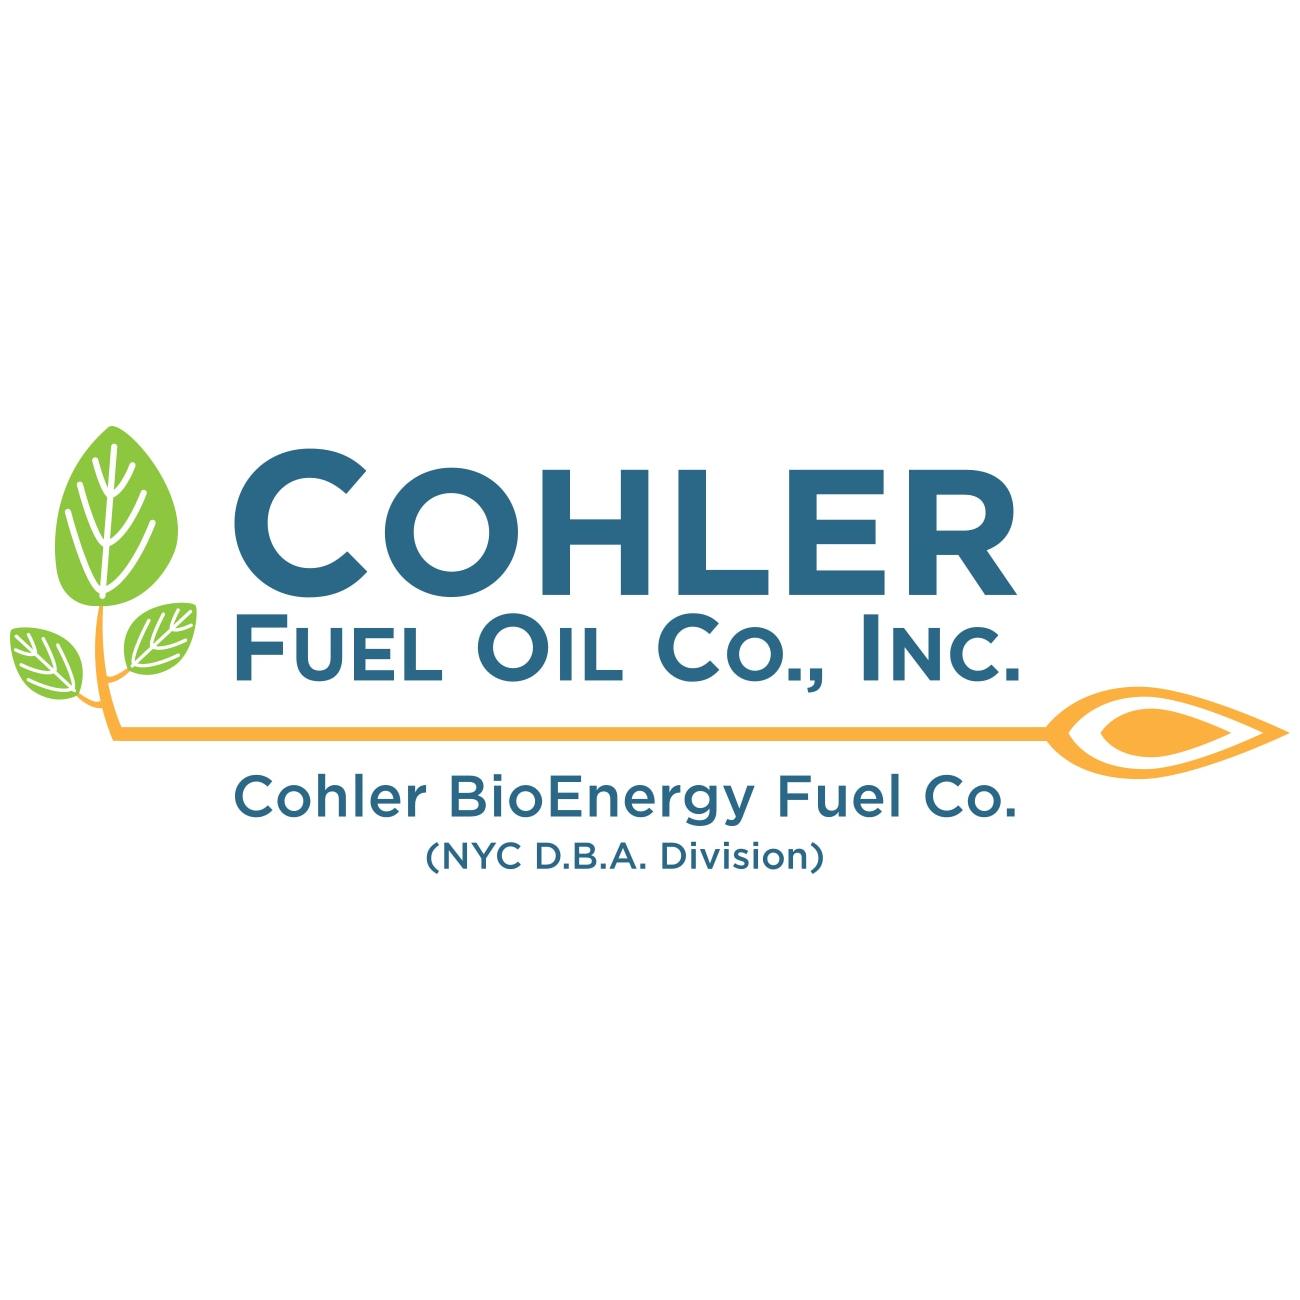 Cohler Fuel Oil Co Inc